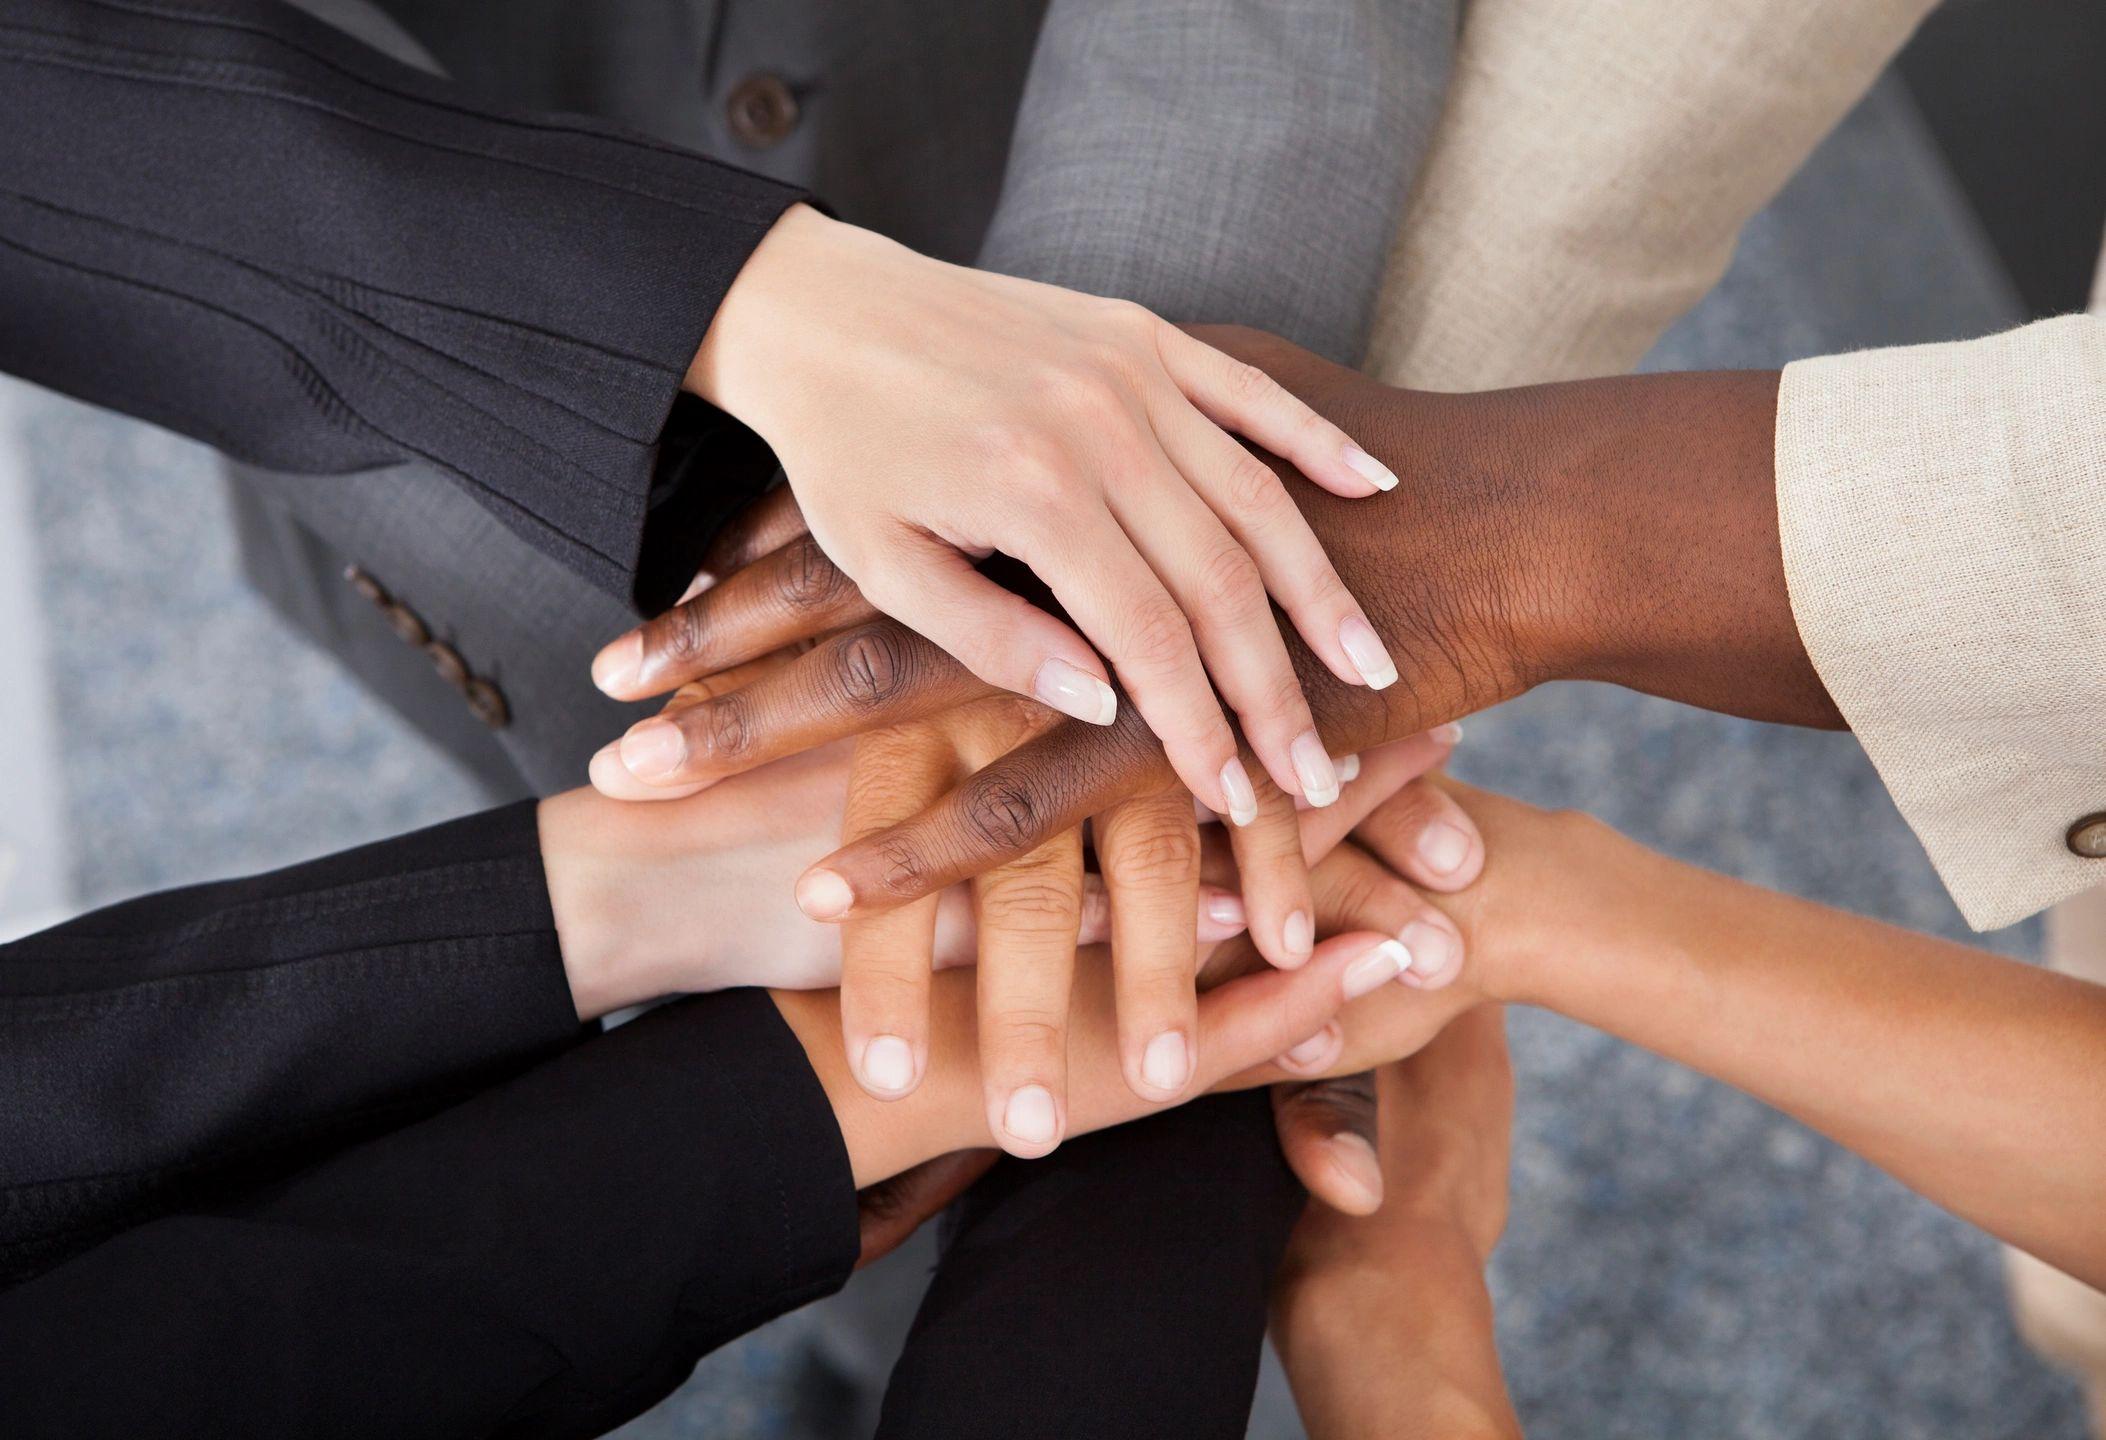 Law Enforcement Training | Community Relations Training